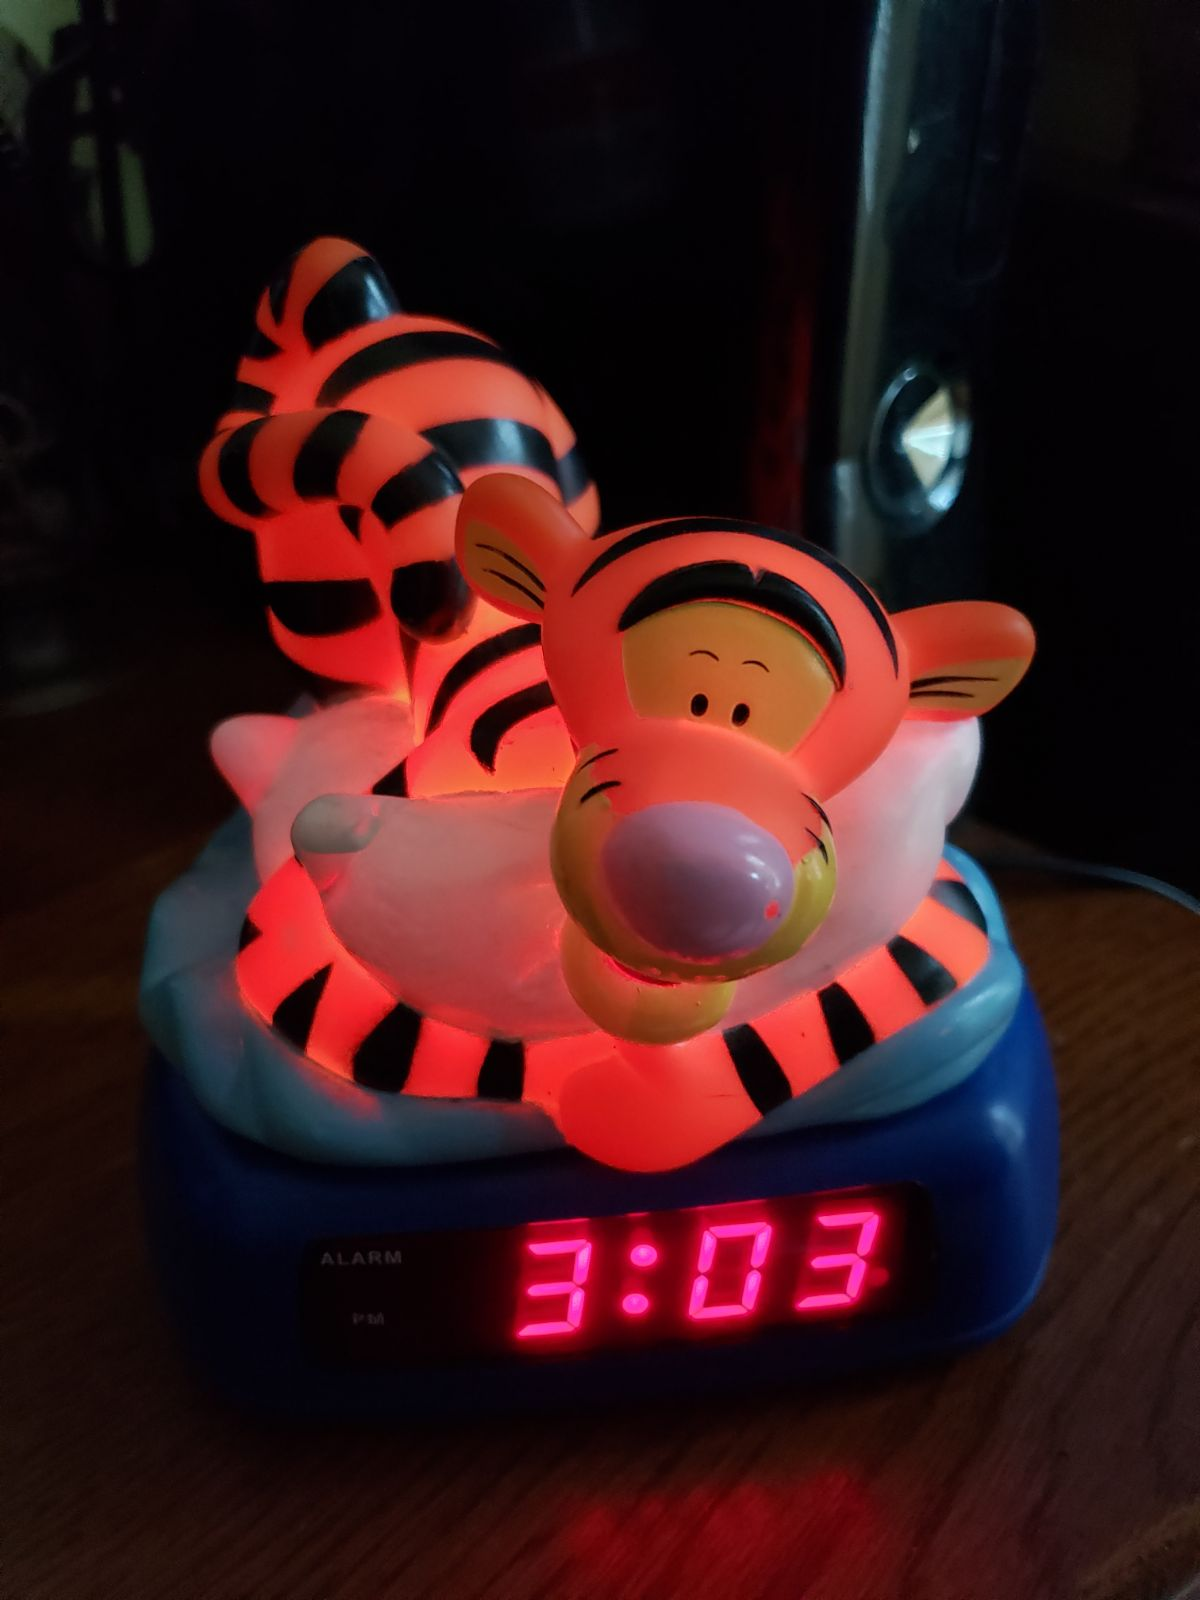 Disney Tigger Alarm Clock Night Light